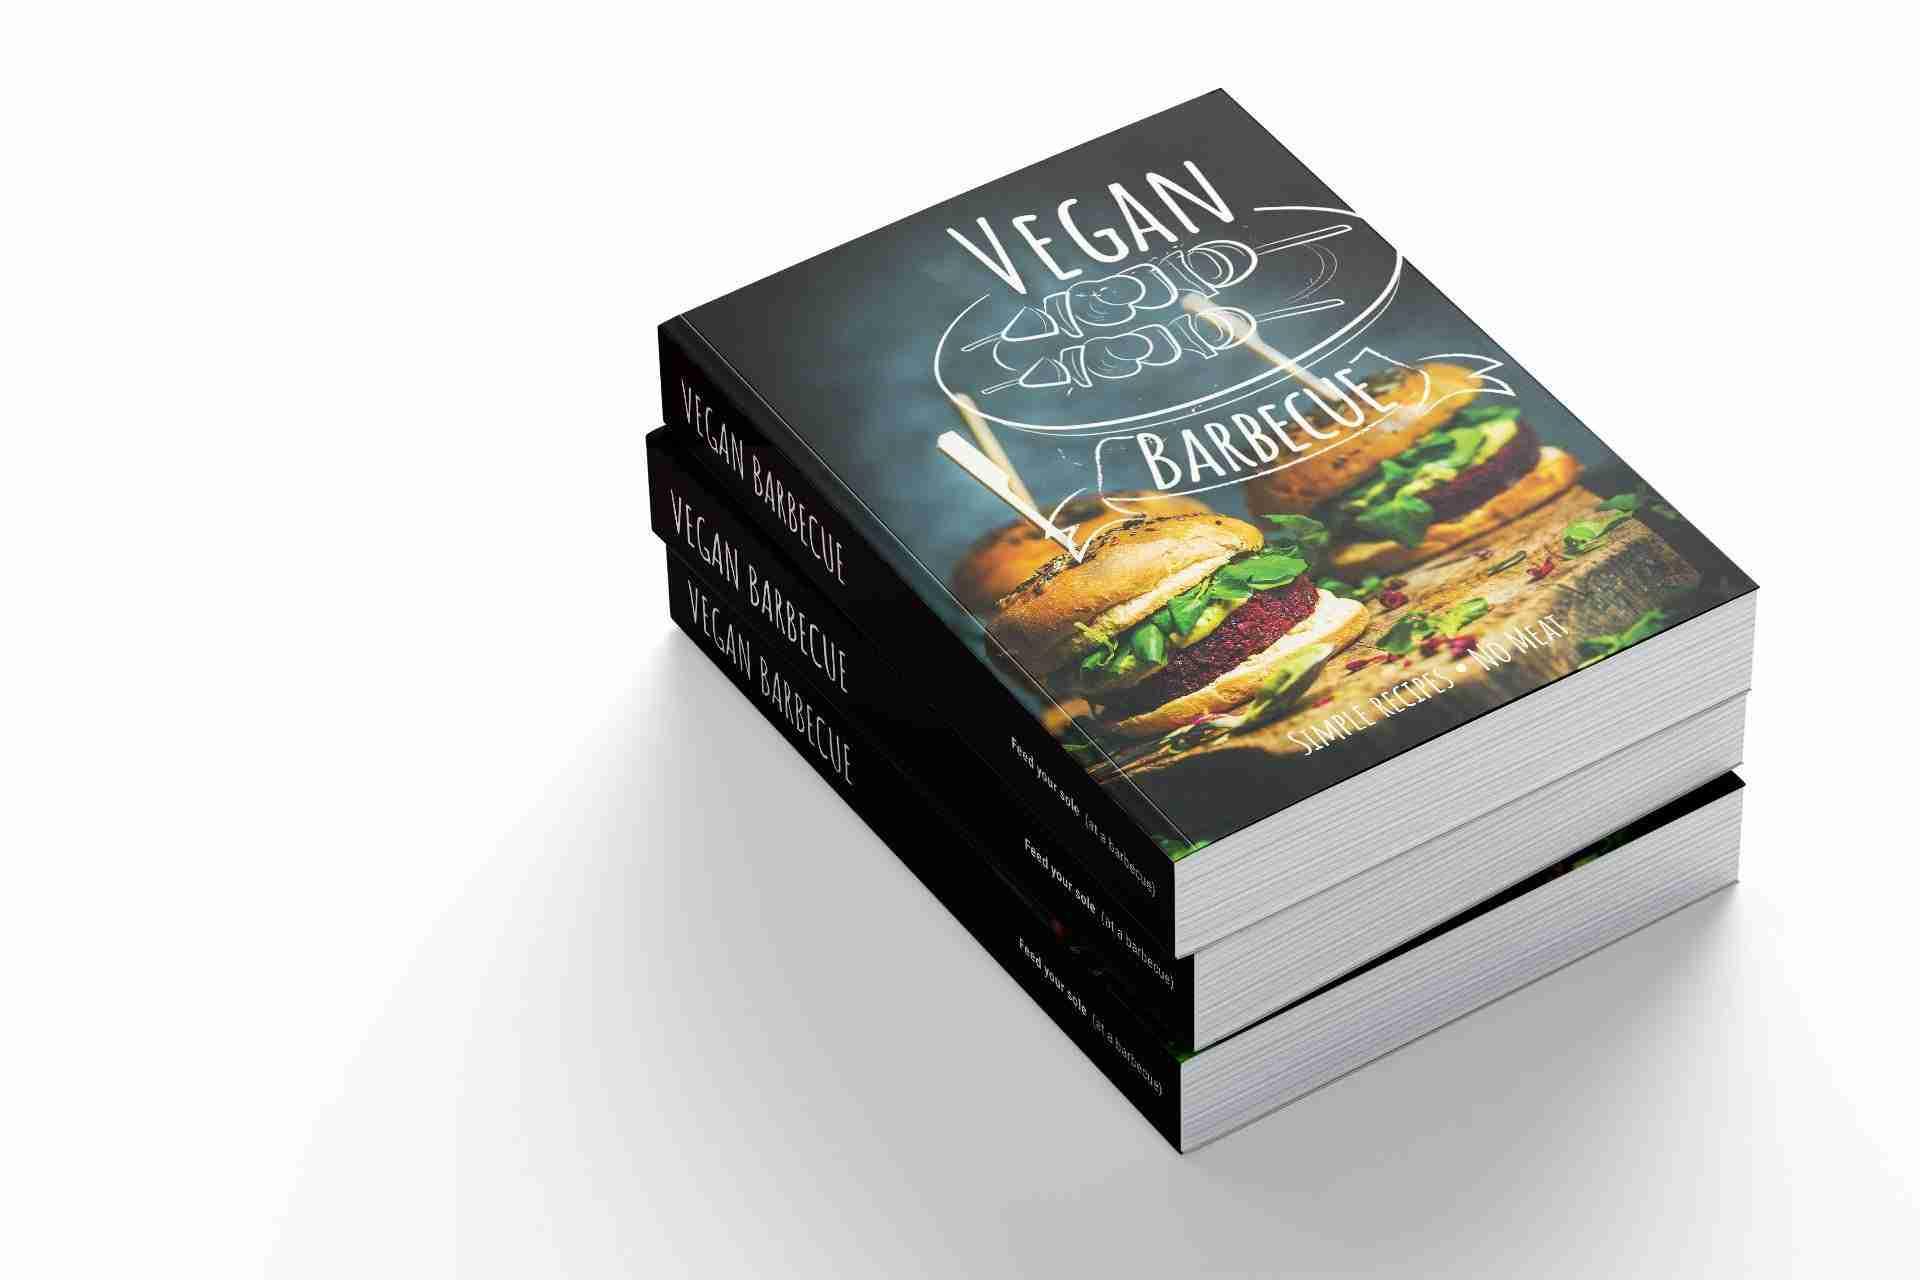 Vegan-BBQ-Book-getitprinted.com_